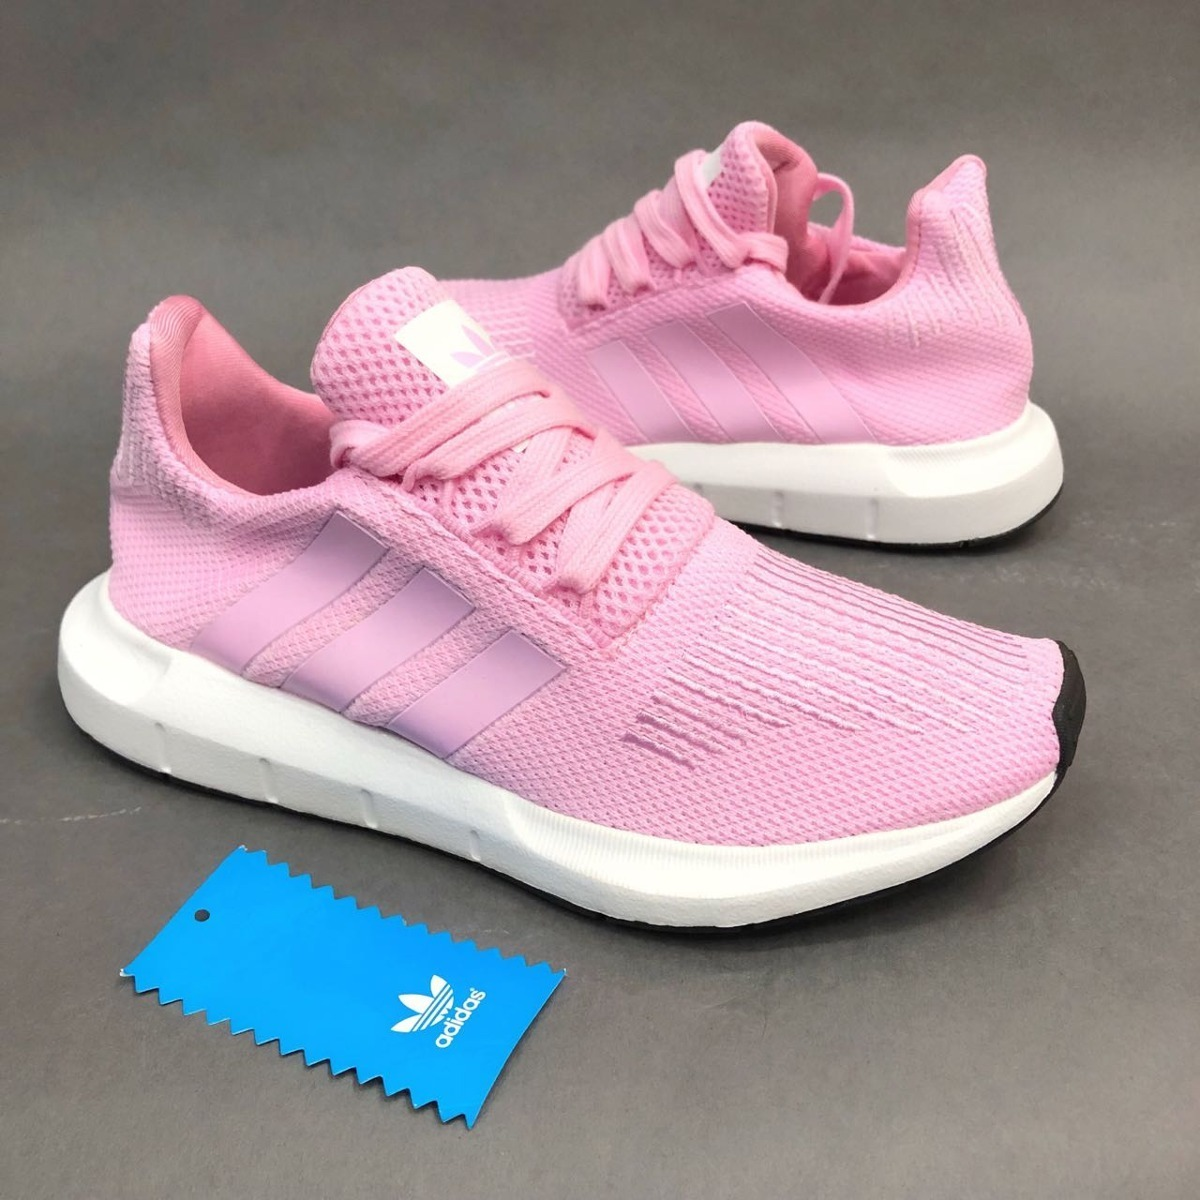 Tenis Todas Rosadas 2018 Para Zapatillas Adidas Swift Dama p4qwn1pr